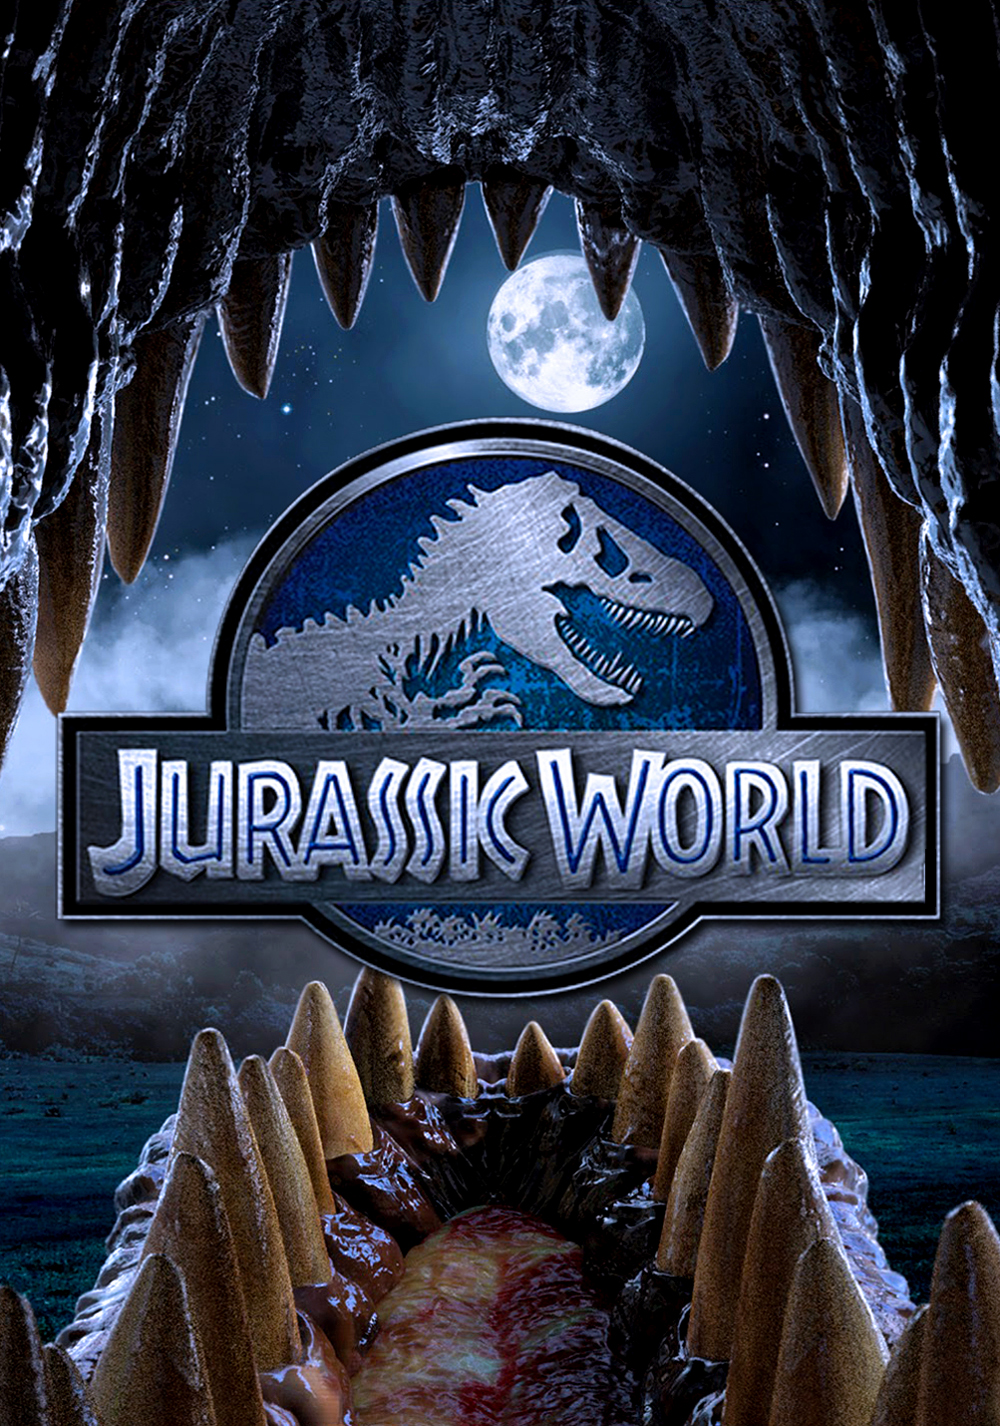 Jurassic World Film